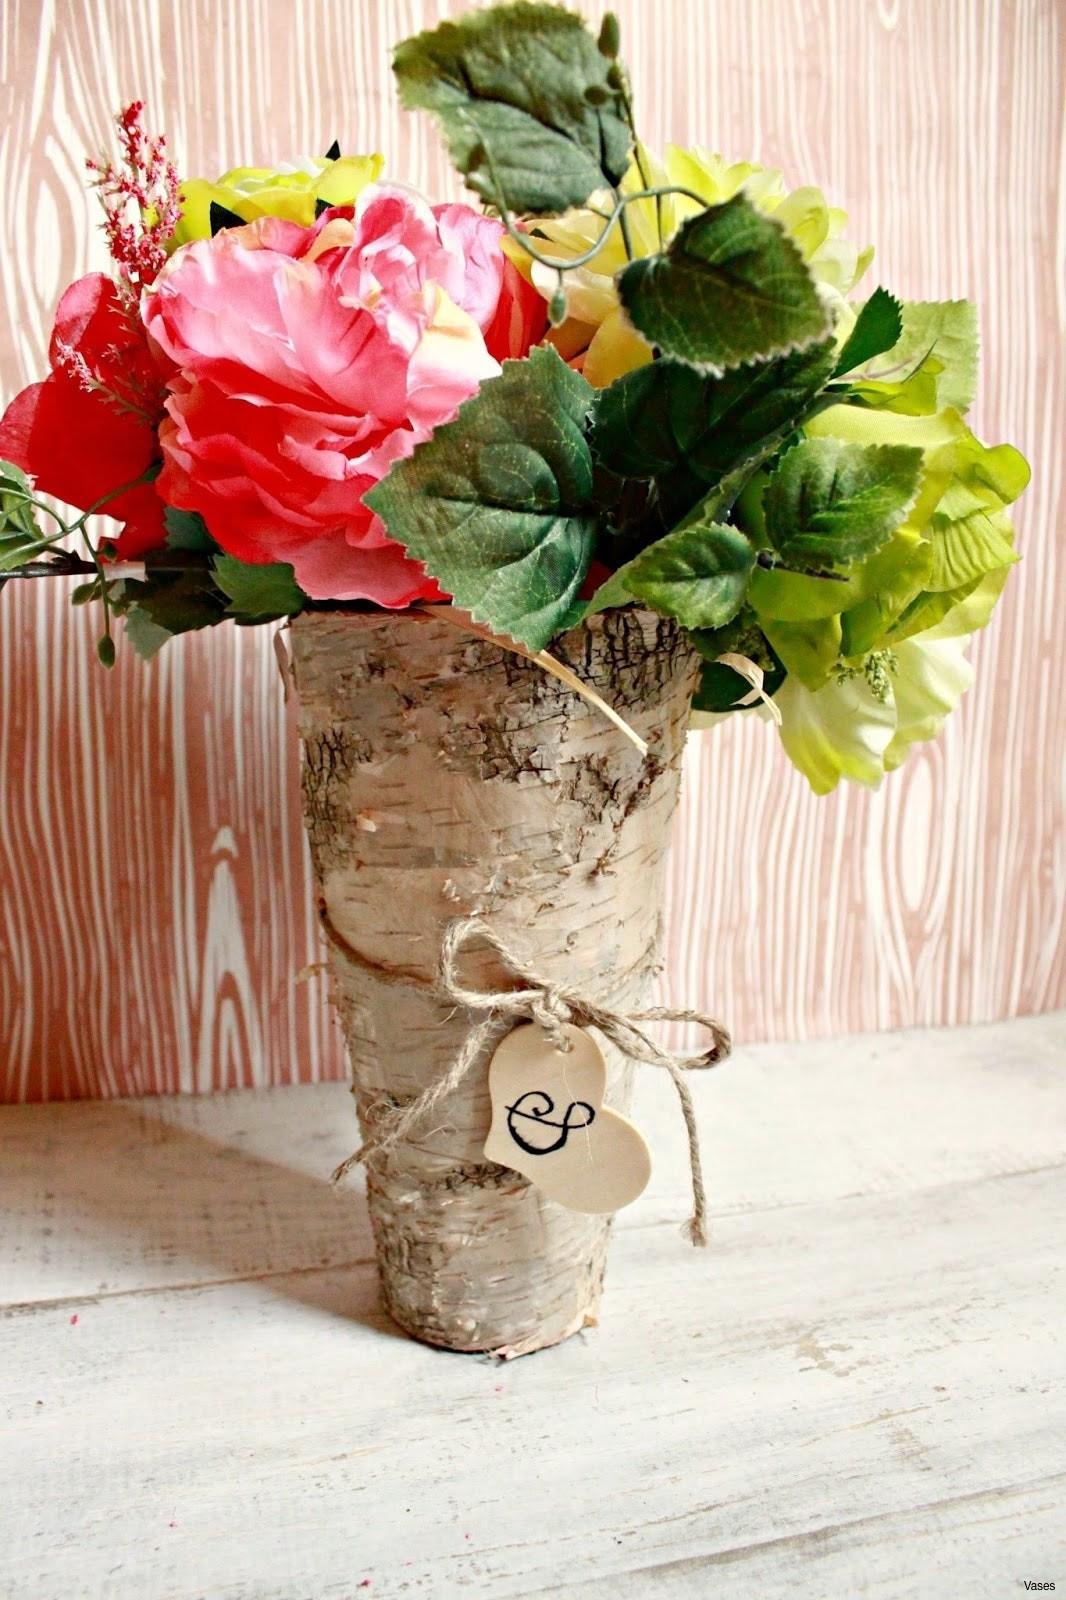 bud vase arrangement of hanging flower vase free stock photo image wallpaper unique wall bud regarding hanging flower vase free stock photo image wallpaper unique white wall vase collection